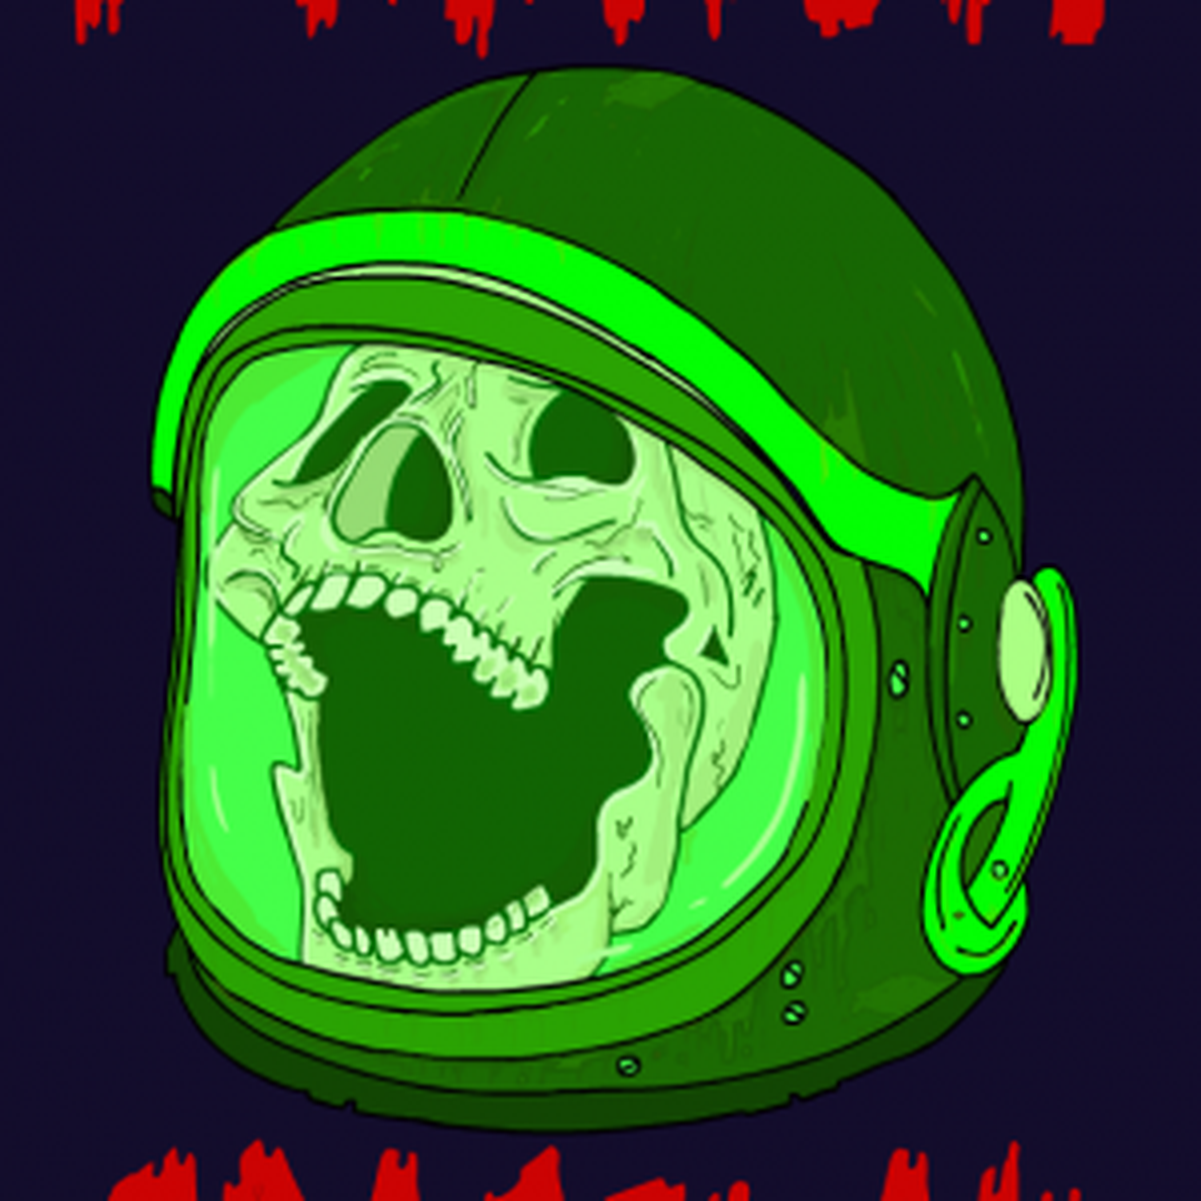 Phantom Spaceman wiki, Phantom Spaceman review, Phantom Spaceman history, Phantom Spaceman news